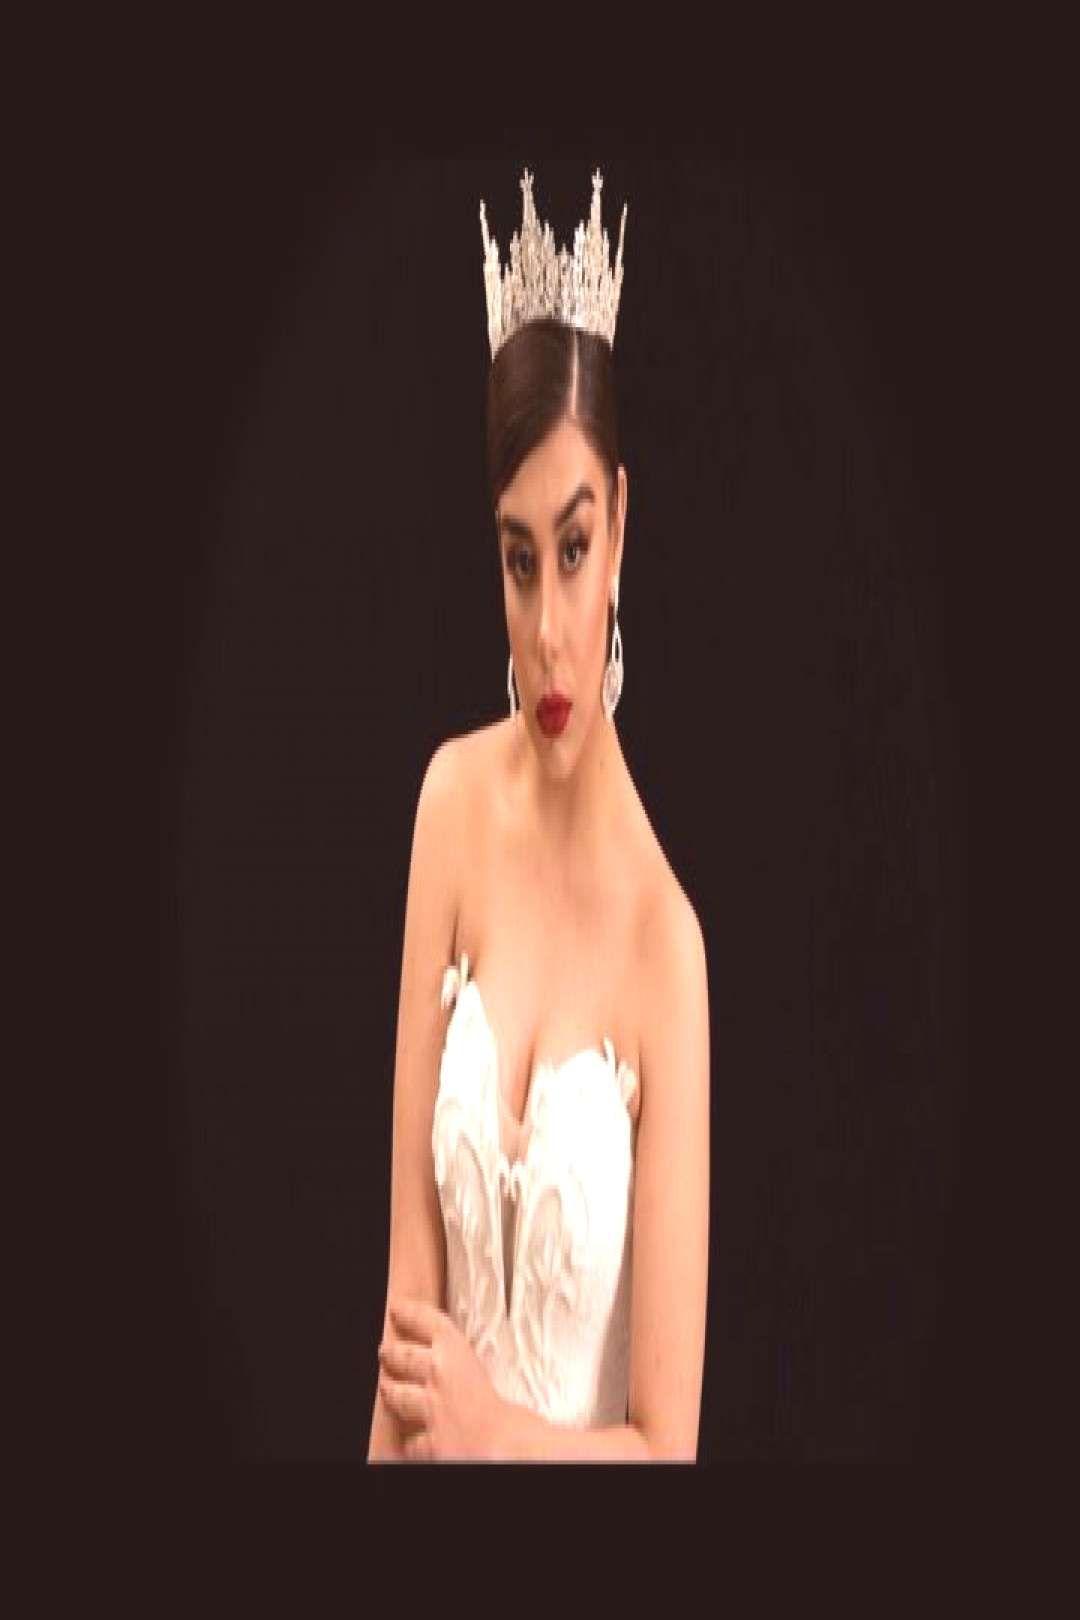 #weddingvideogeraphy #fashionphotography #weddingphoto #noghi #sony #p .noghi .p #weddingphoto #weddingvideogeraphy #fashionphotography You can find Sony and more on our website..noghi .p #weddingphoto #weddingvideogeraphy #fashionphotography